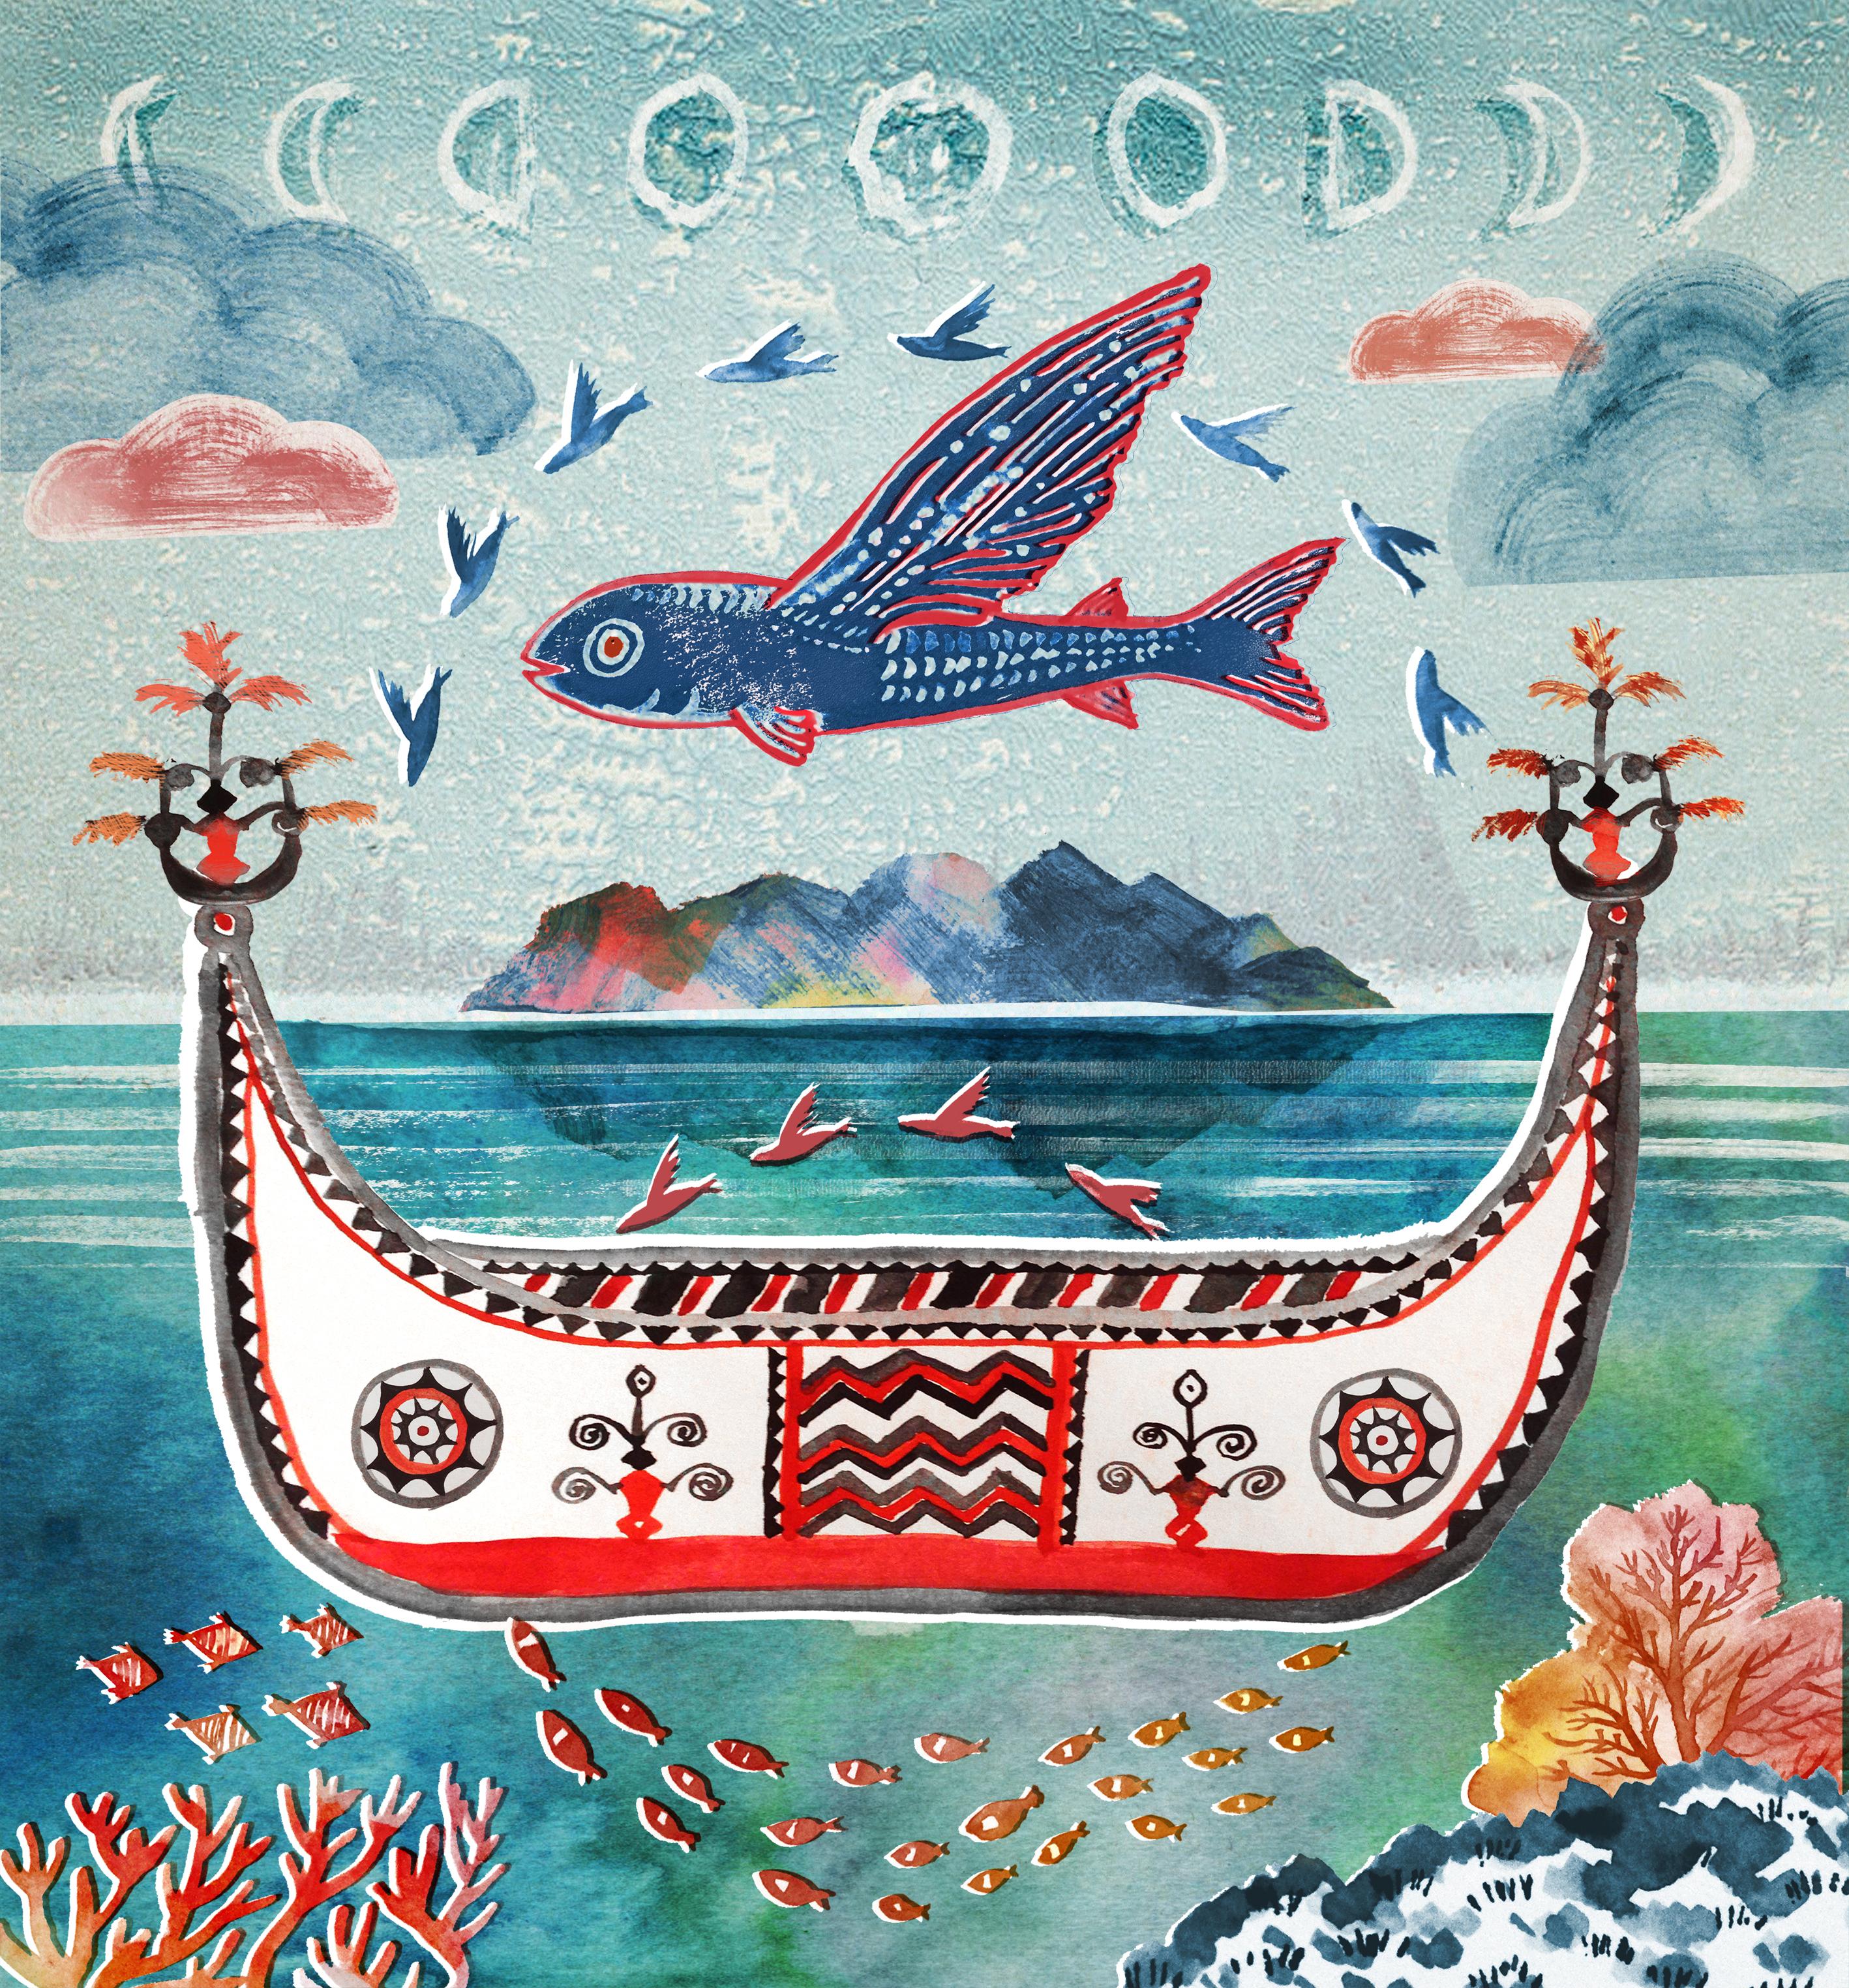 Flying Fish Ceremony 蘭嶼飛魚季